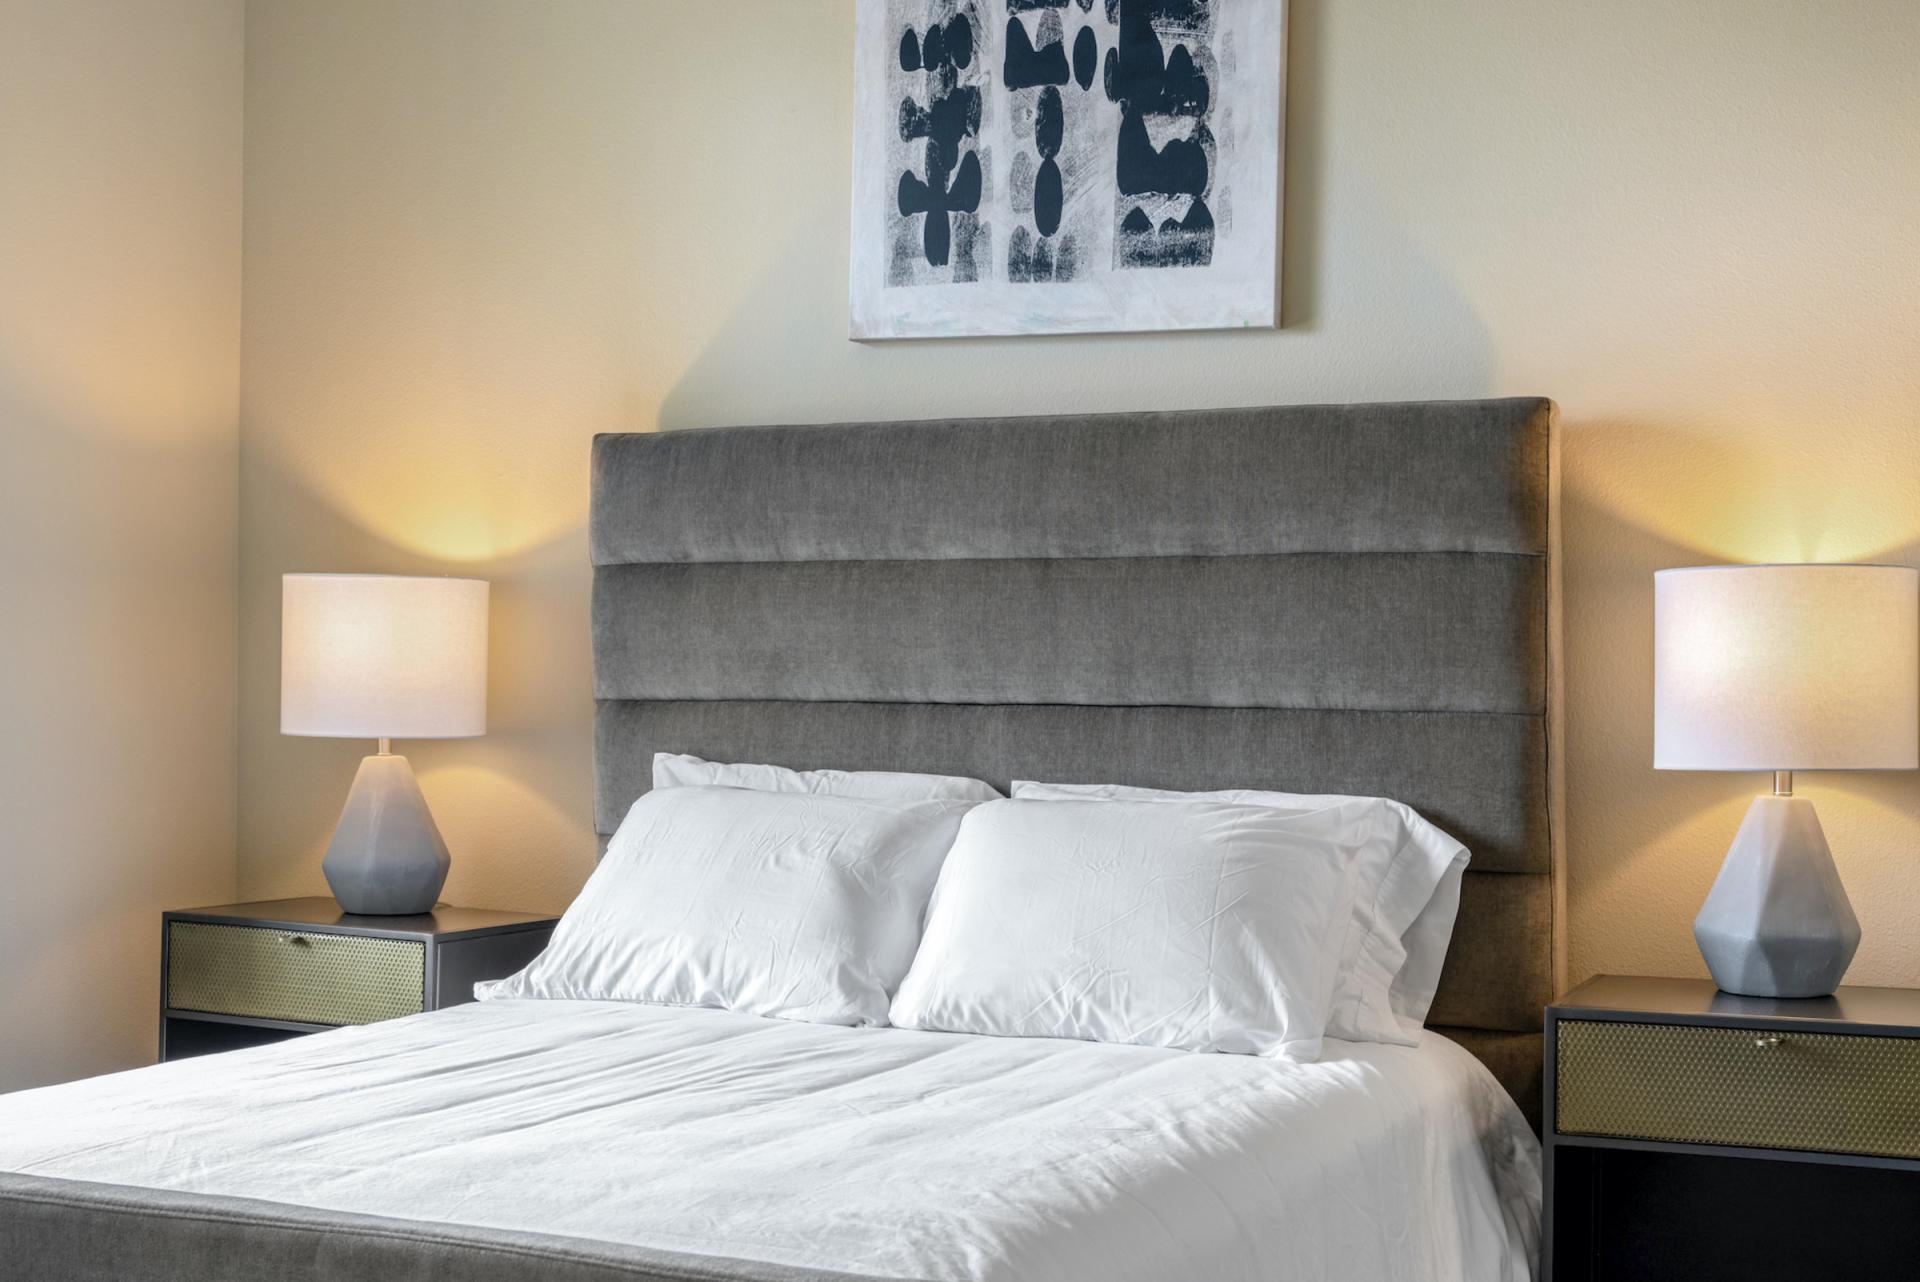 Bed at Apartments at The Crosby, Deep Ellum, Dallas